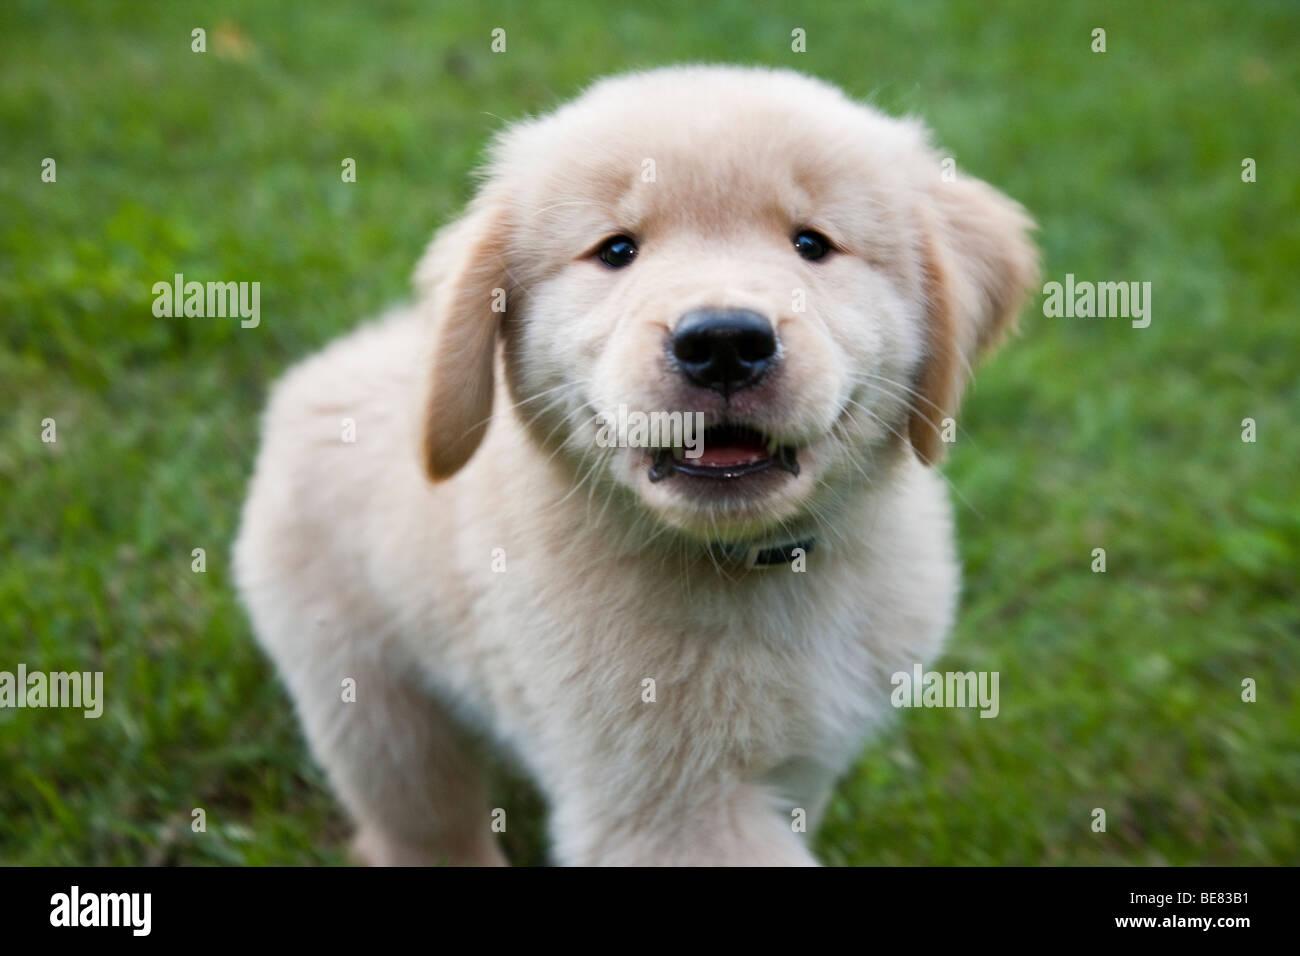 Eight week old Golden Retriever puppy. - Stock Image